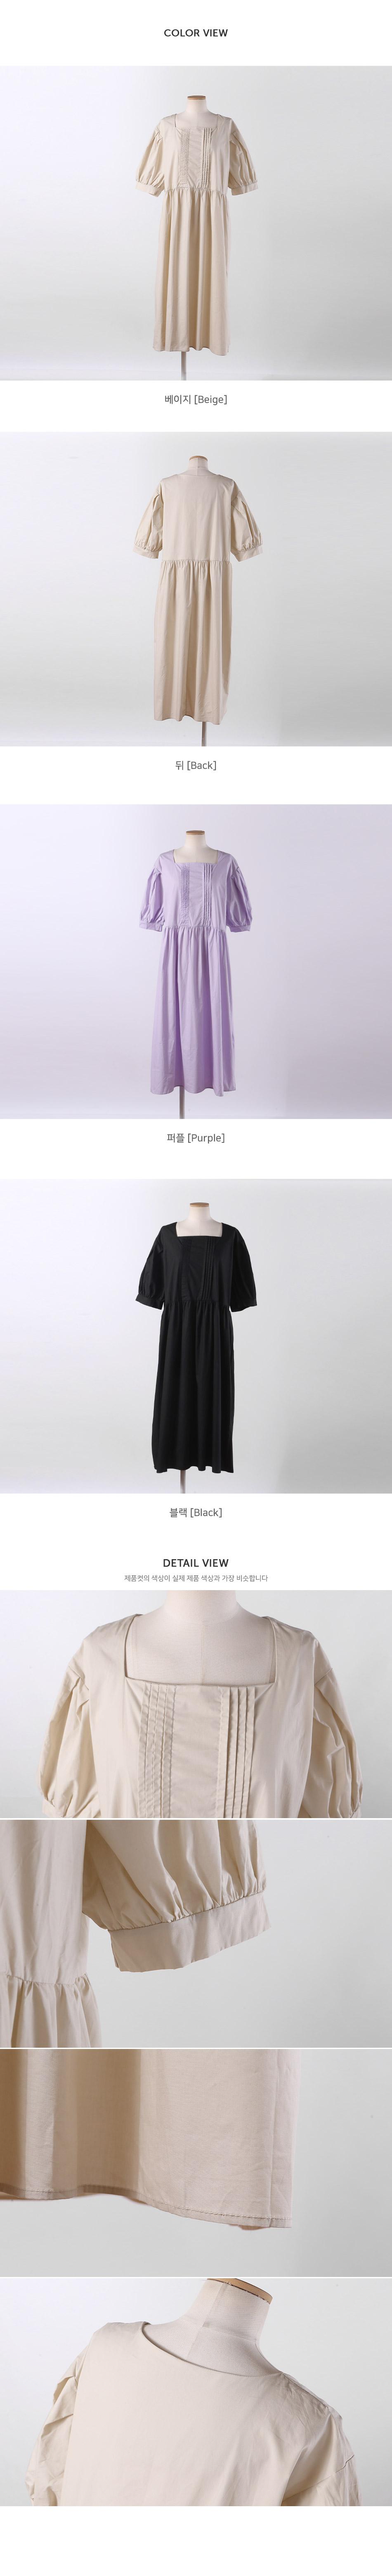 Crampin Tuck Square Over Long Dress